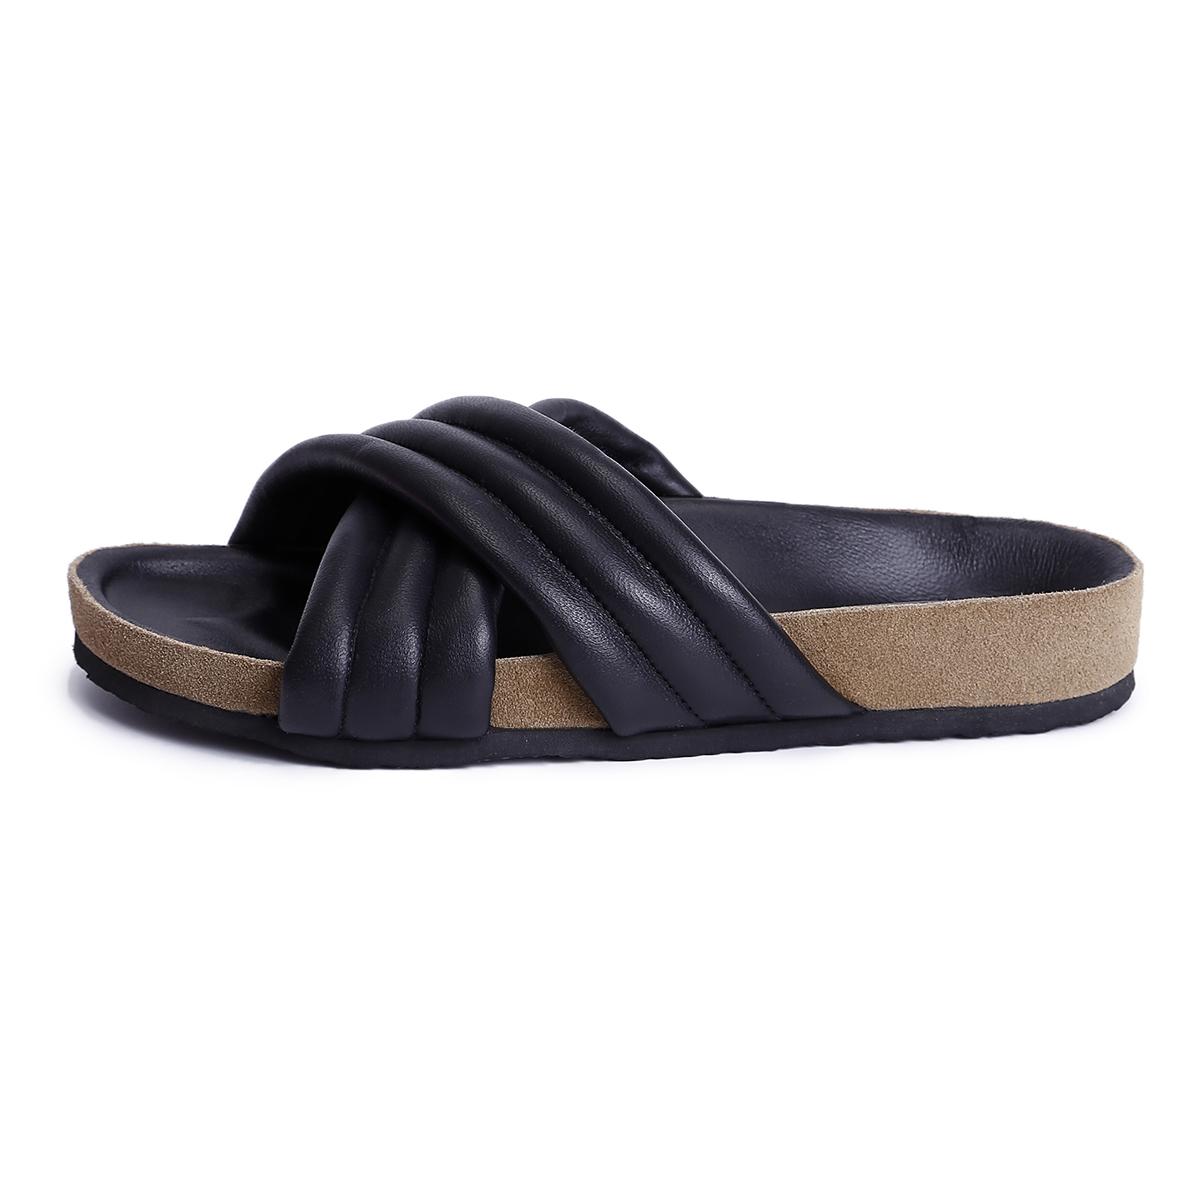 8616bc57045 US  45 - Women s Shoes genuine leather Spring   Summer Comfort Slippers    Flip-Flops Flat Heel open Toe - www.ardenfurtado.com